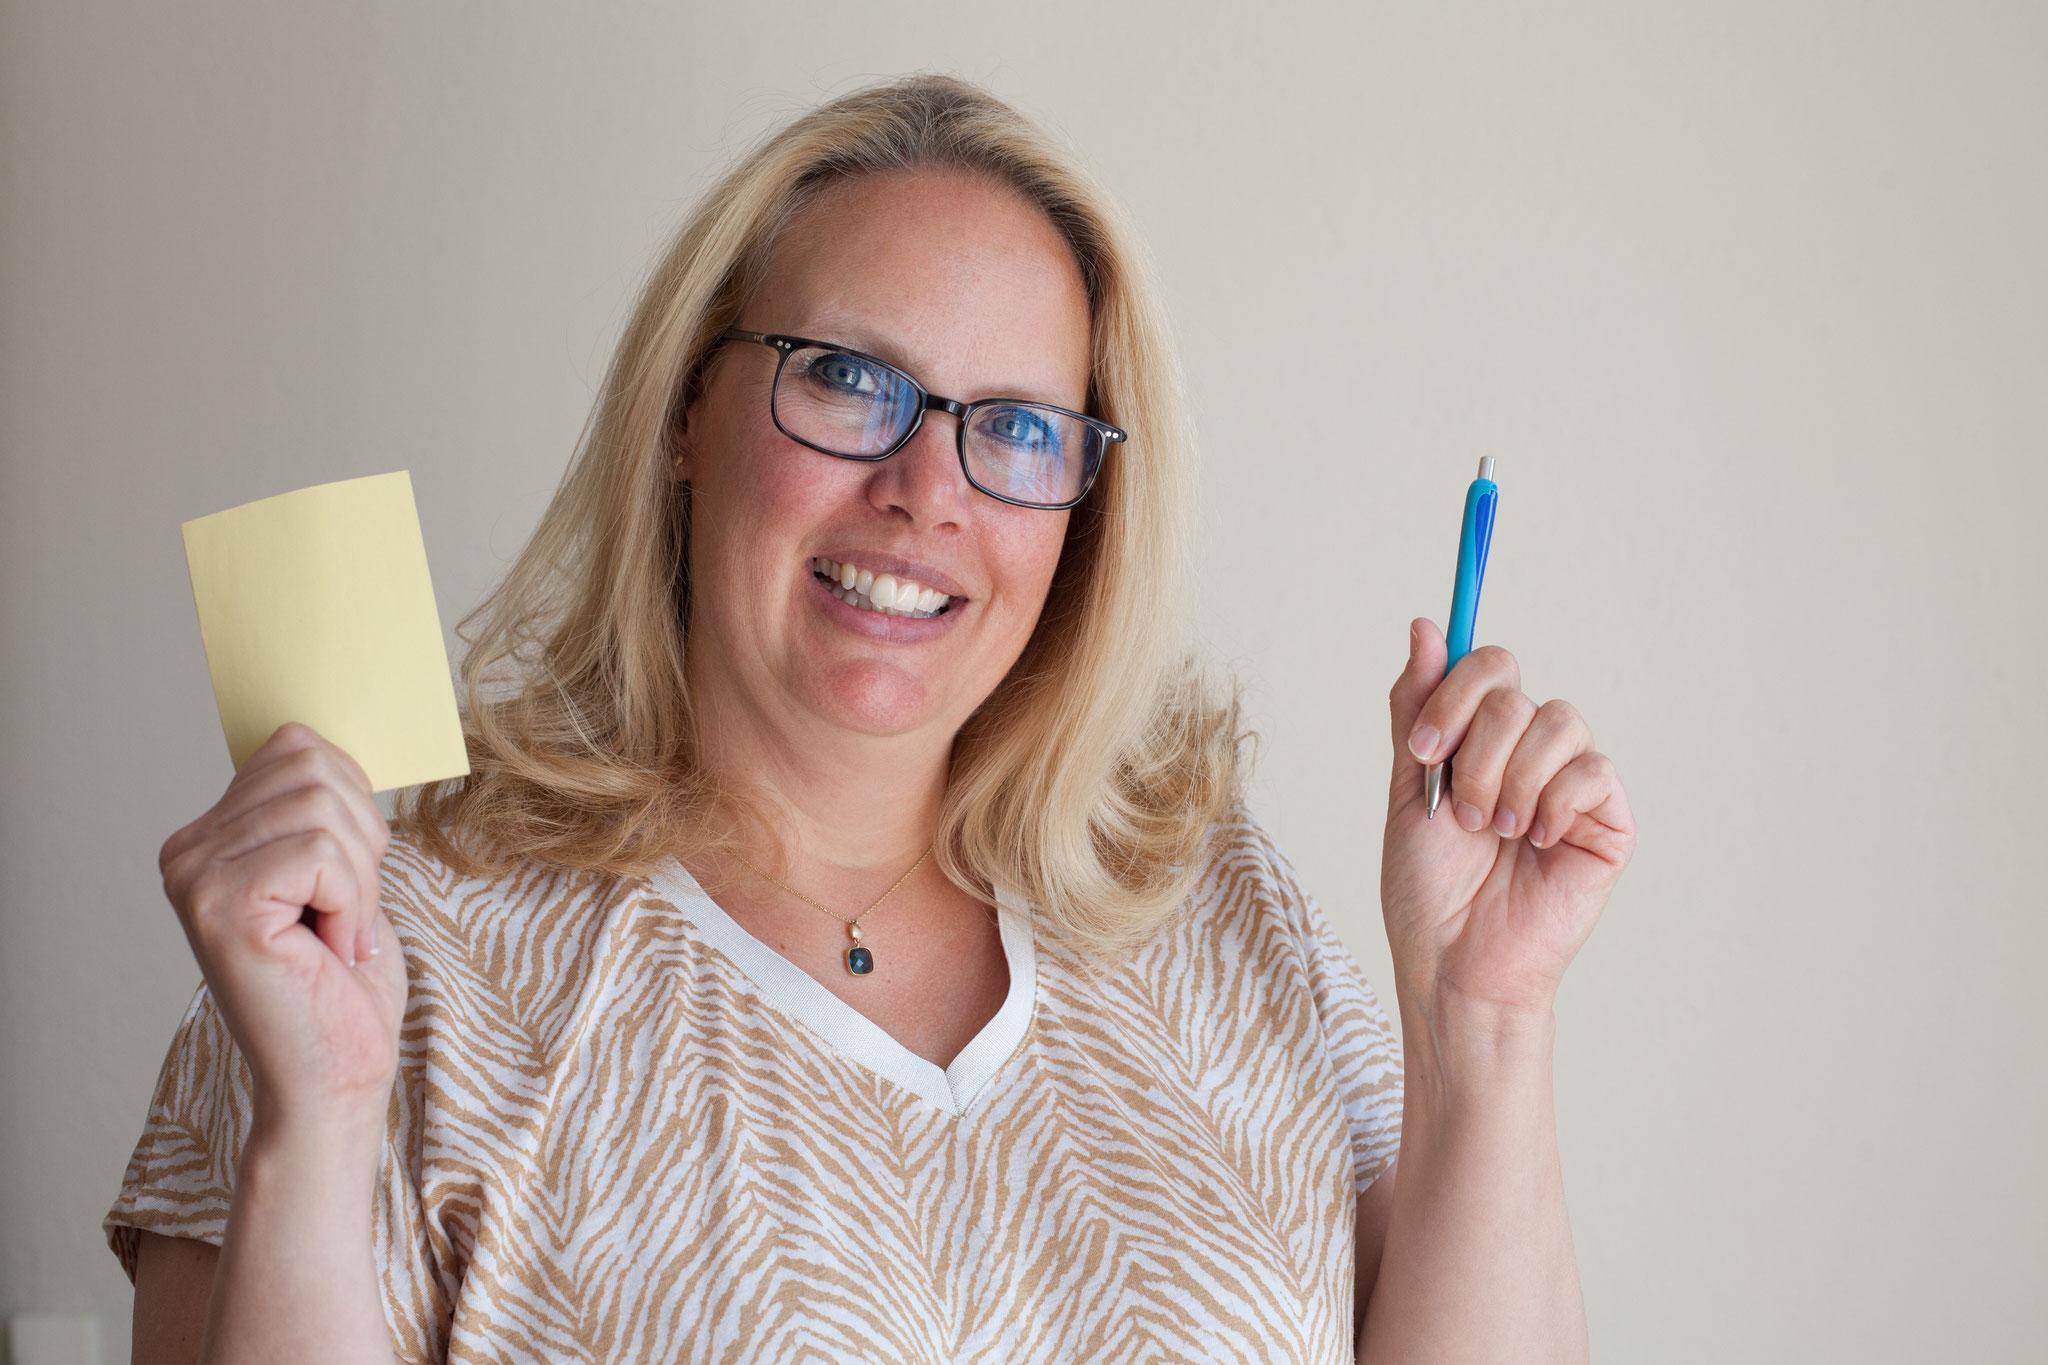 Sandra - Balie-assistente, Sterilisatie-assistente, Contactpersoon Infomedics